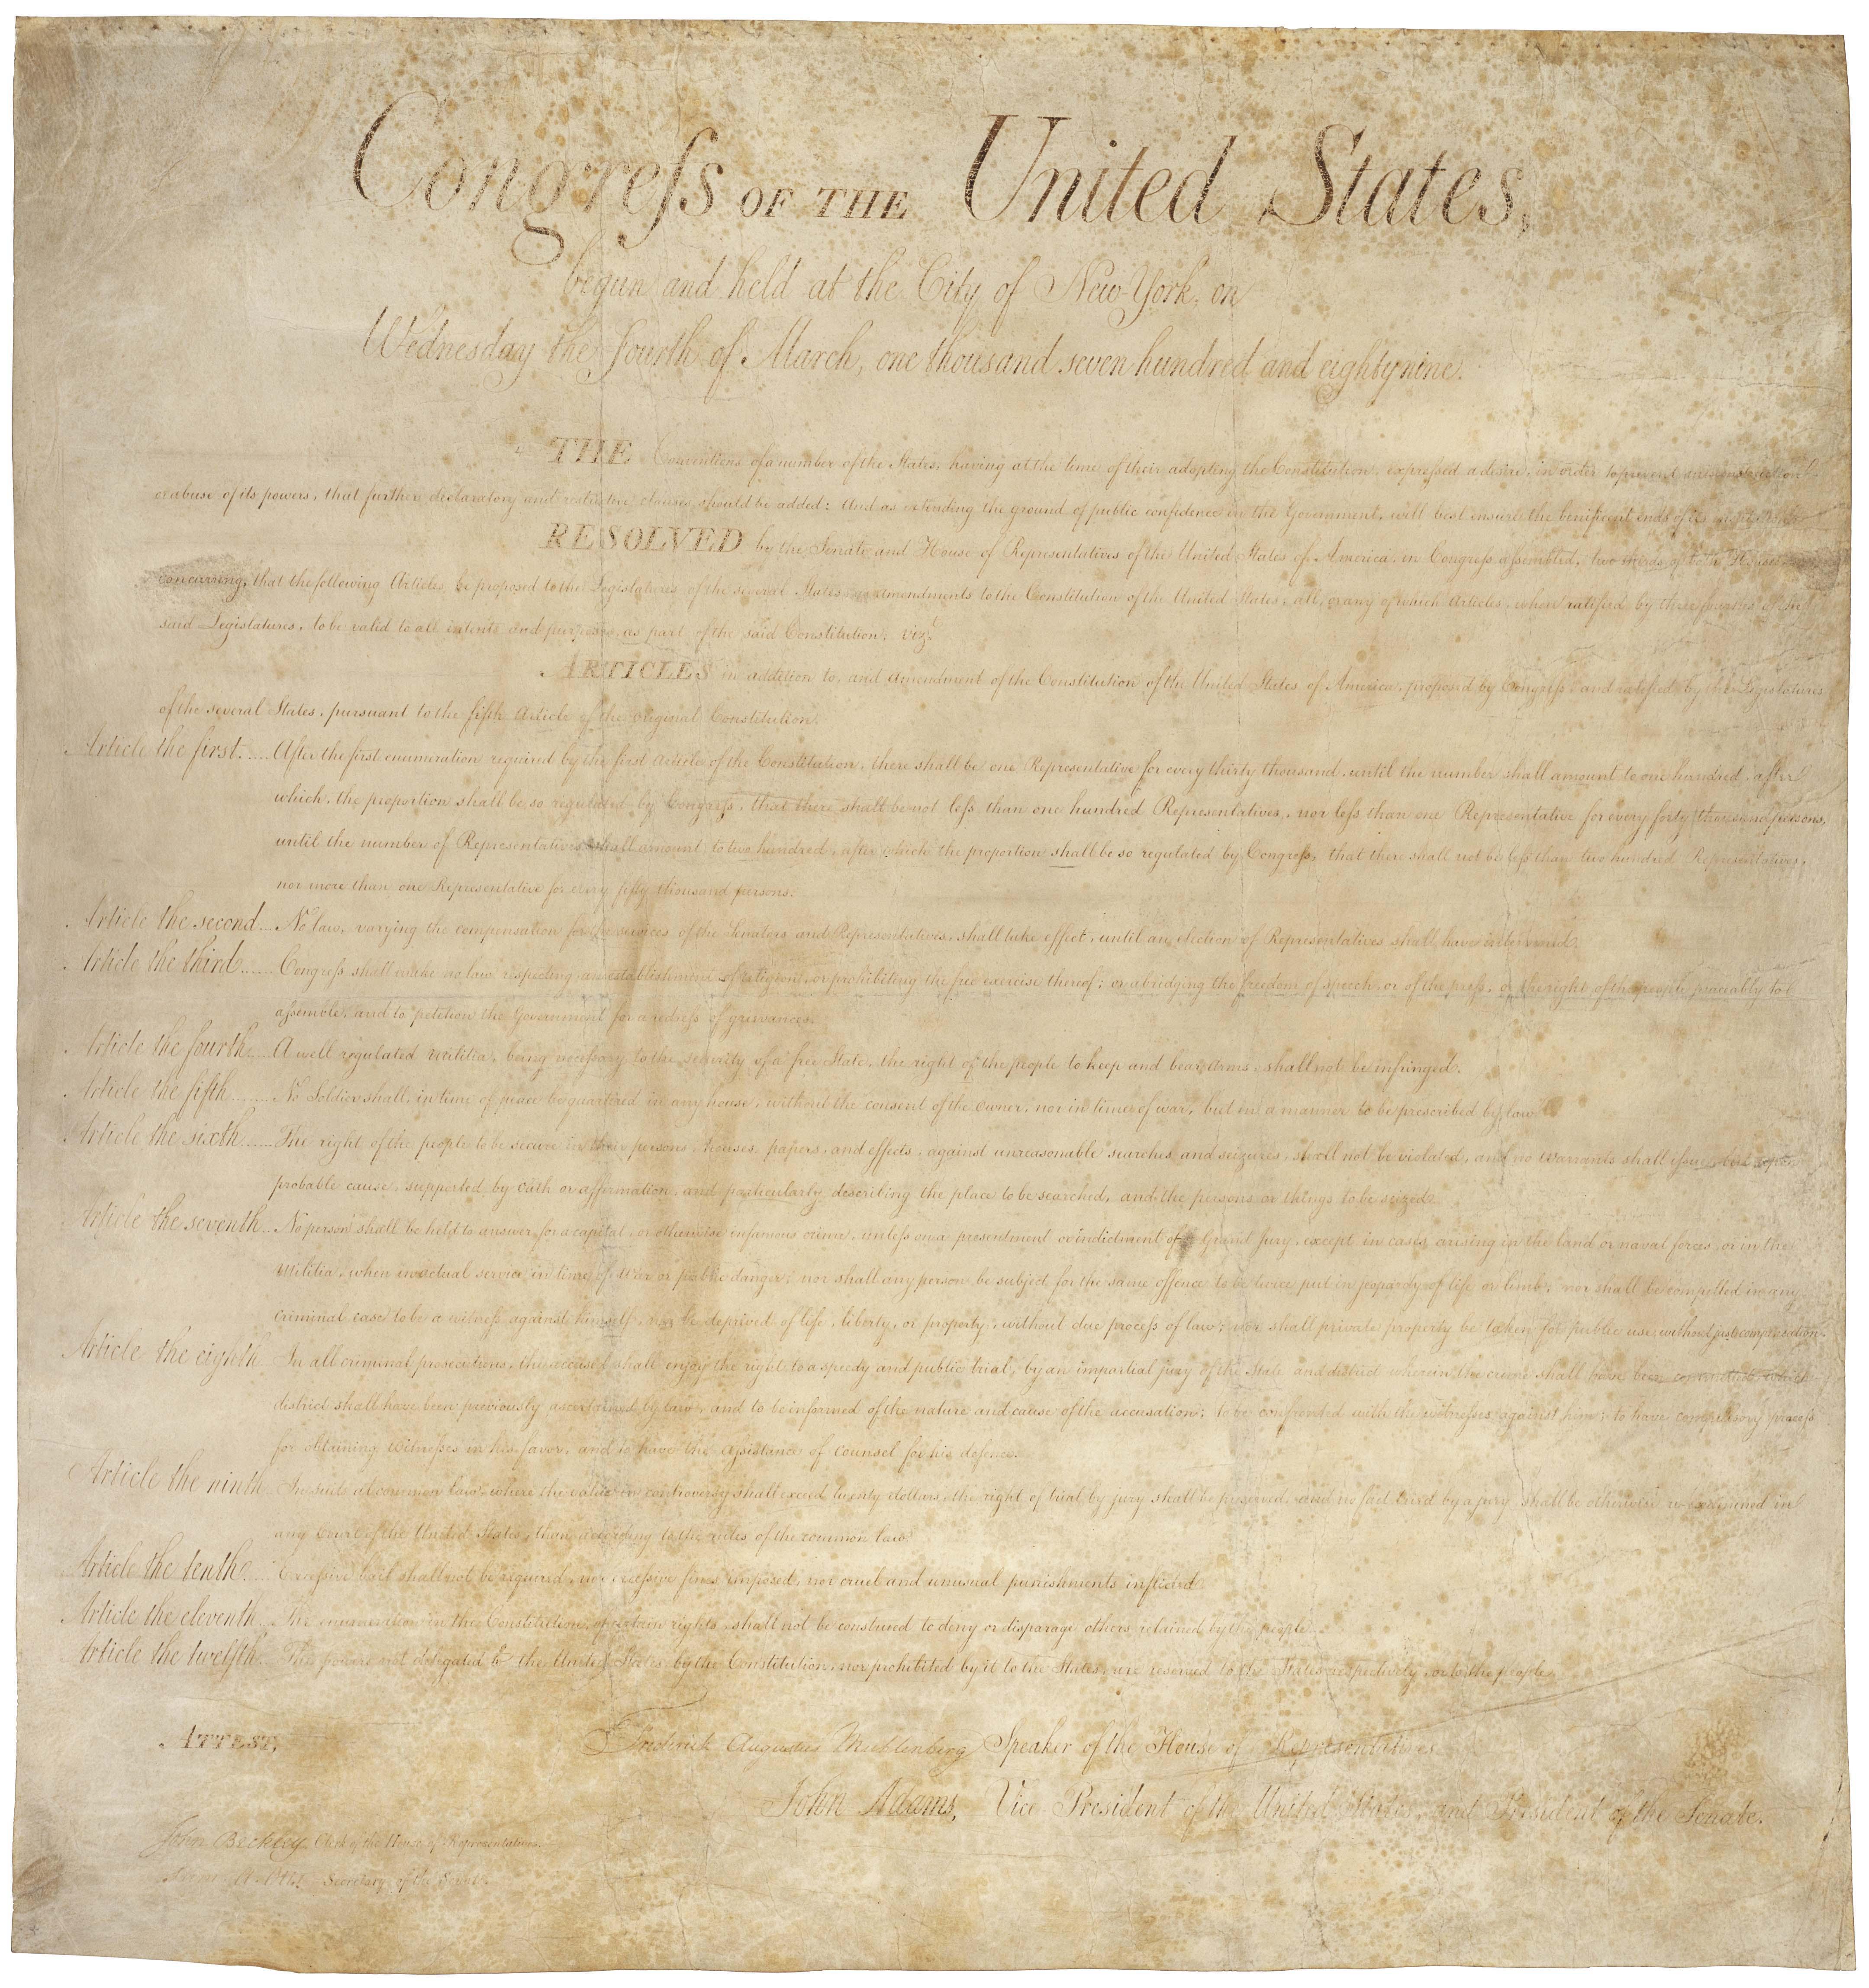 美國權利法案(United States of Rights)。取自/維基百科